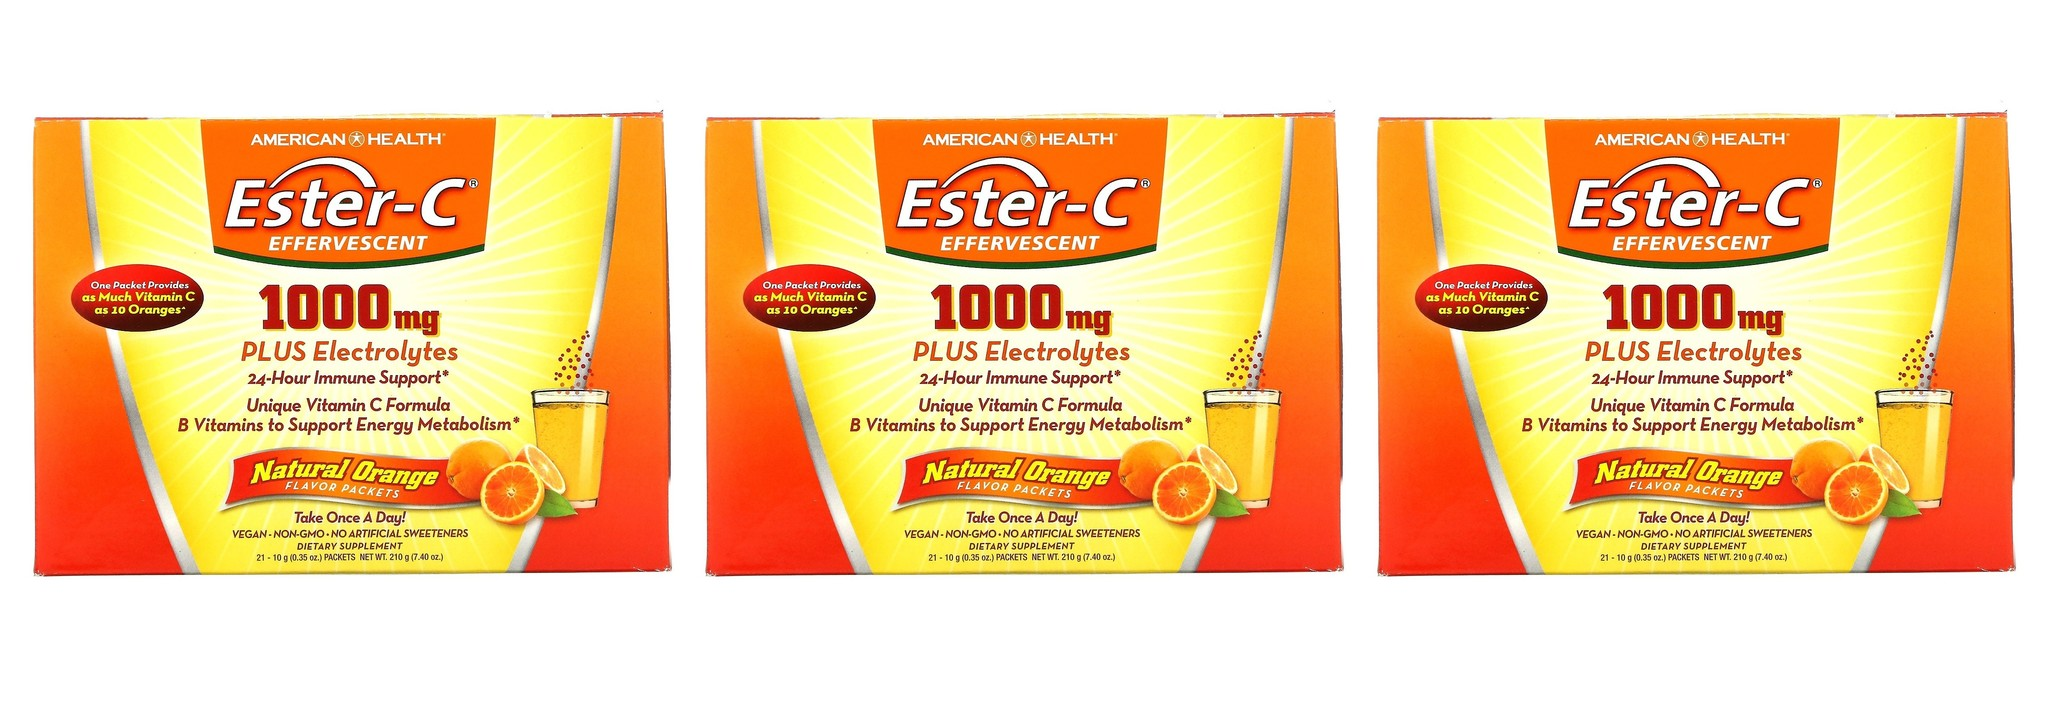 American Health Ester-C Effervescent, Natural Orange Flavor, 1,000 mg, 21 Packets, 0.35 Oz (10 g) Each, 3-packs